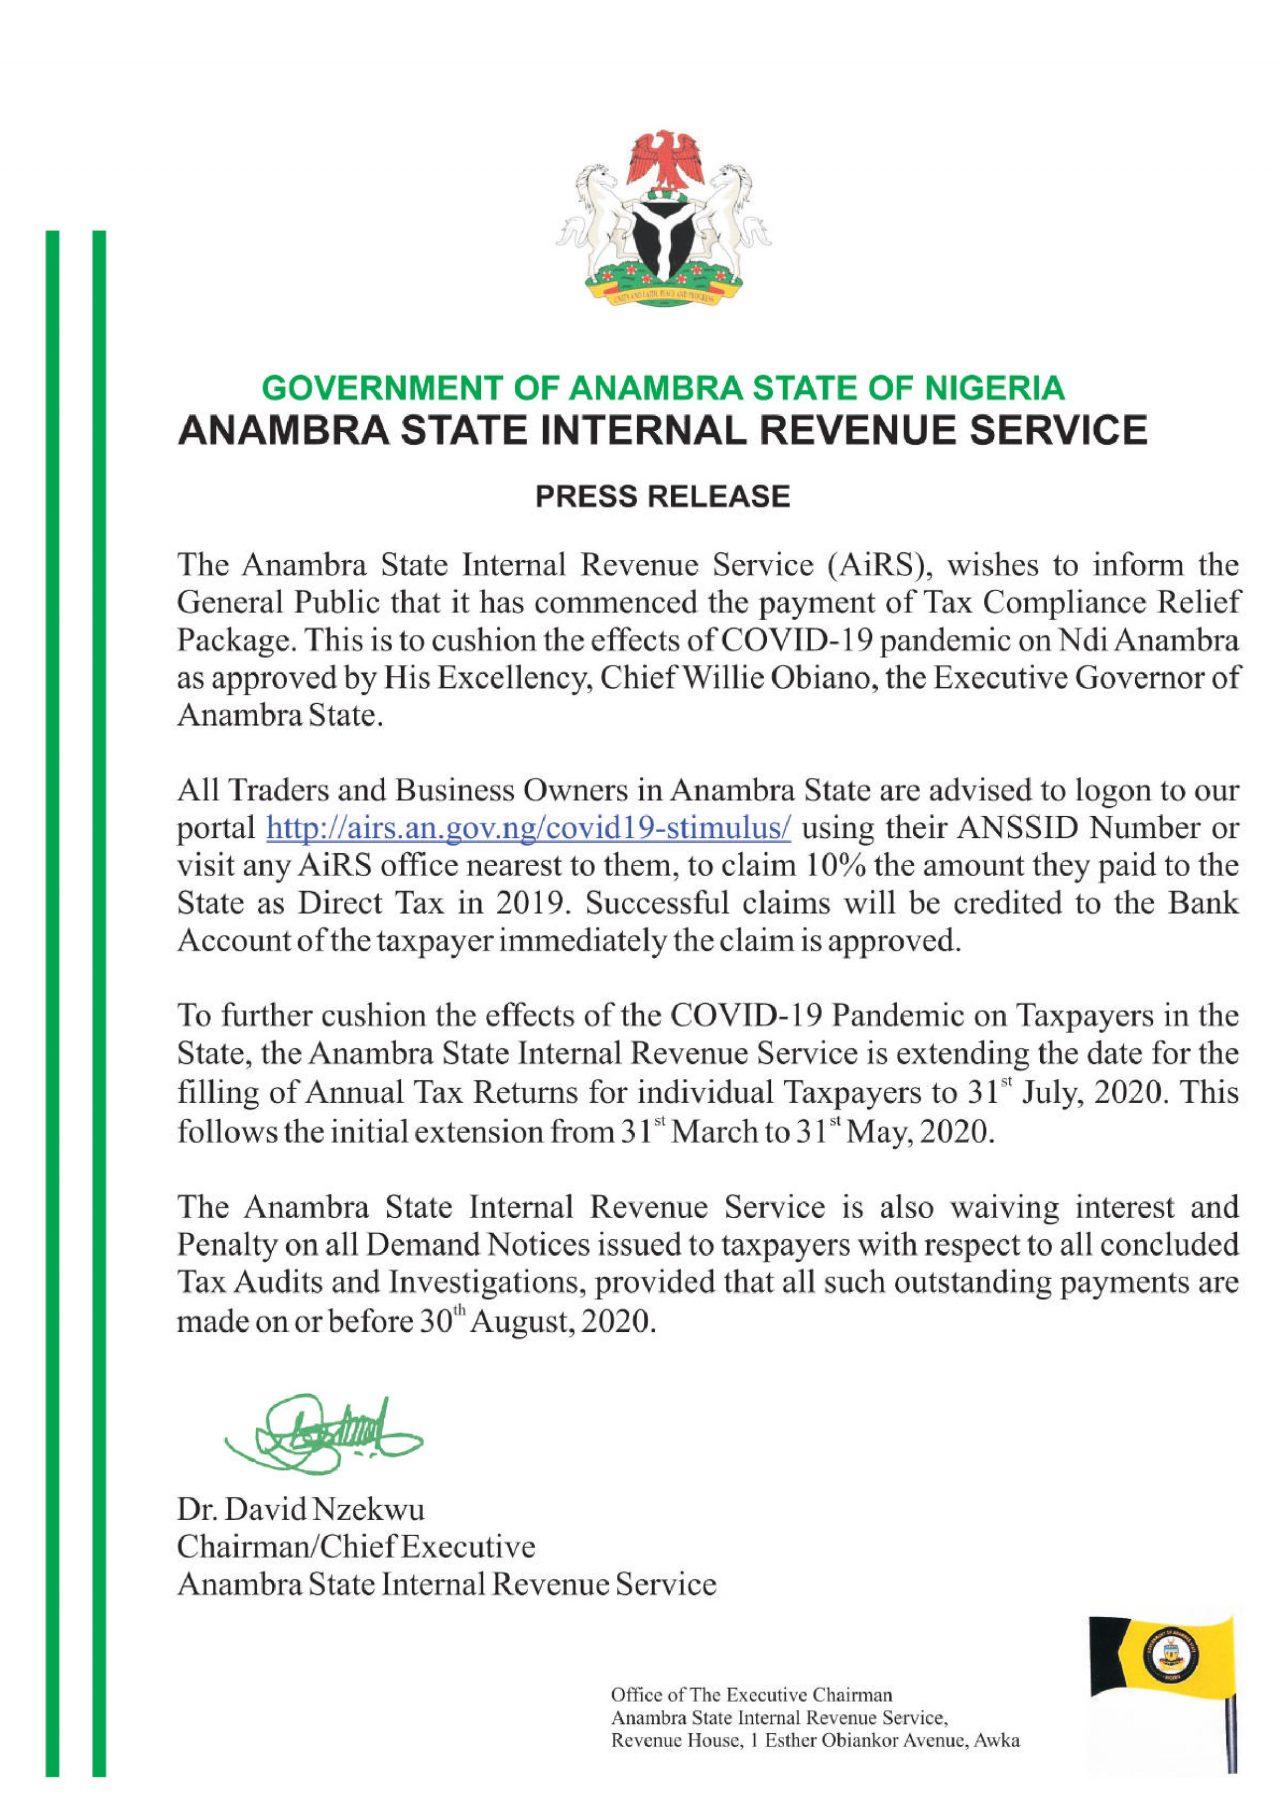 Anambra State Internal Revenue Service Press Release Anambra State Internal Revenue Service